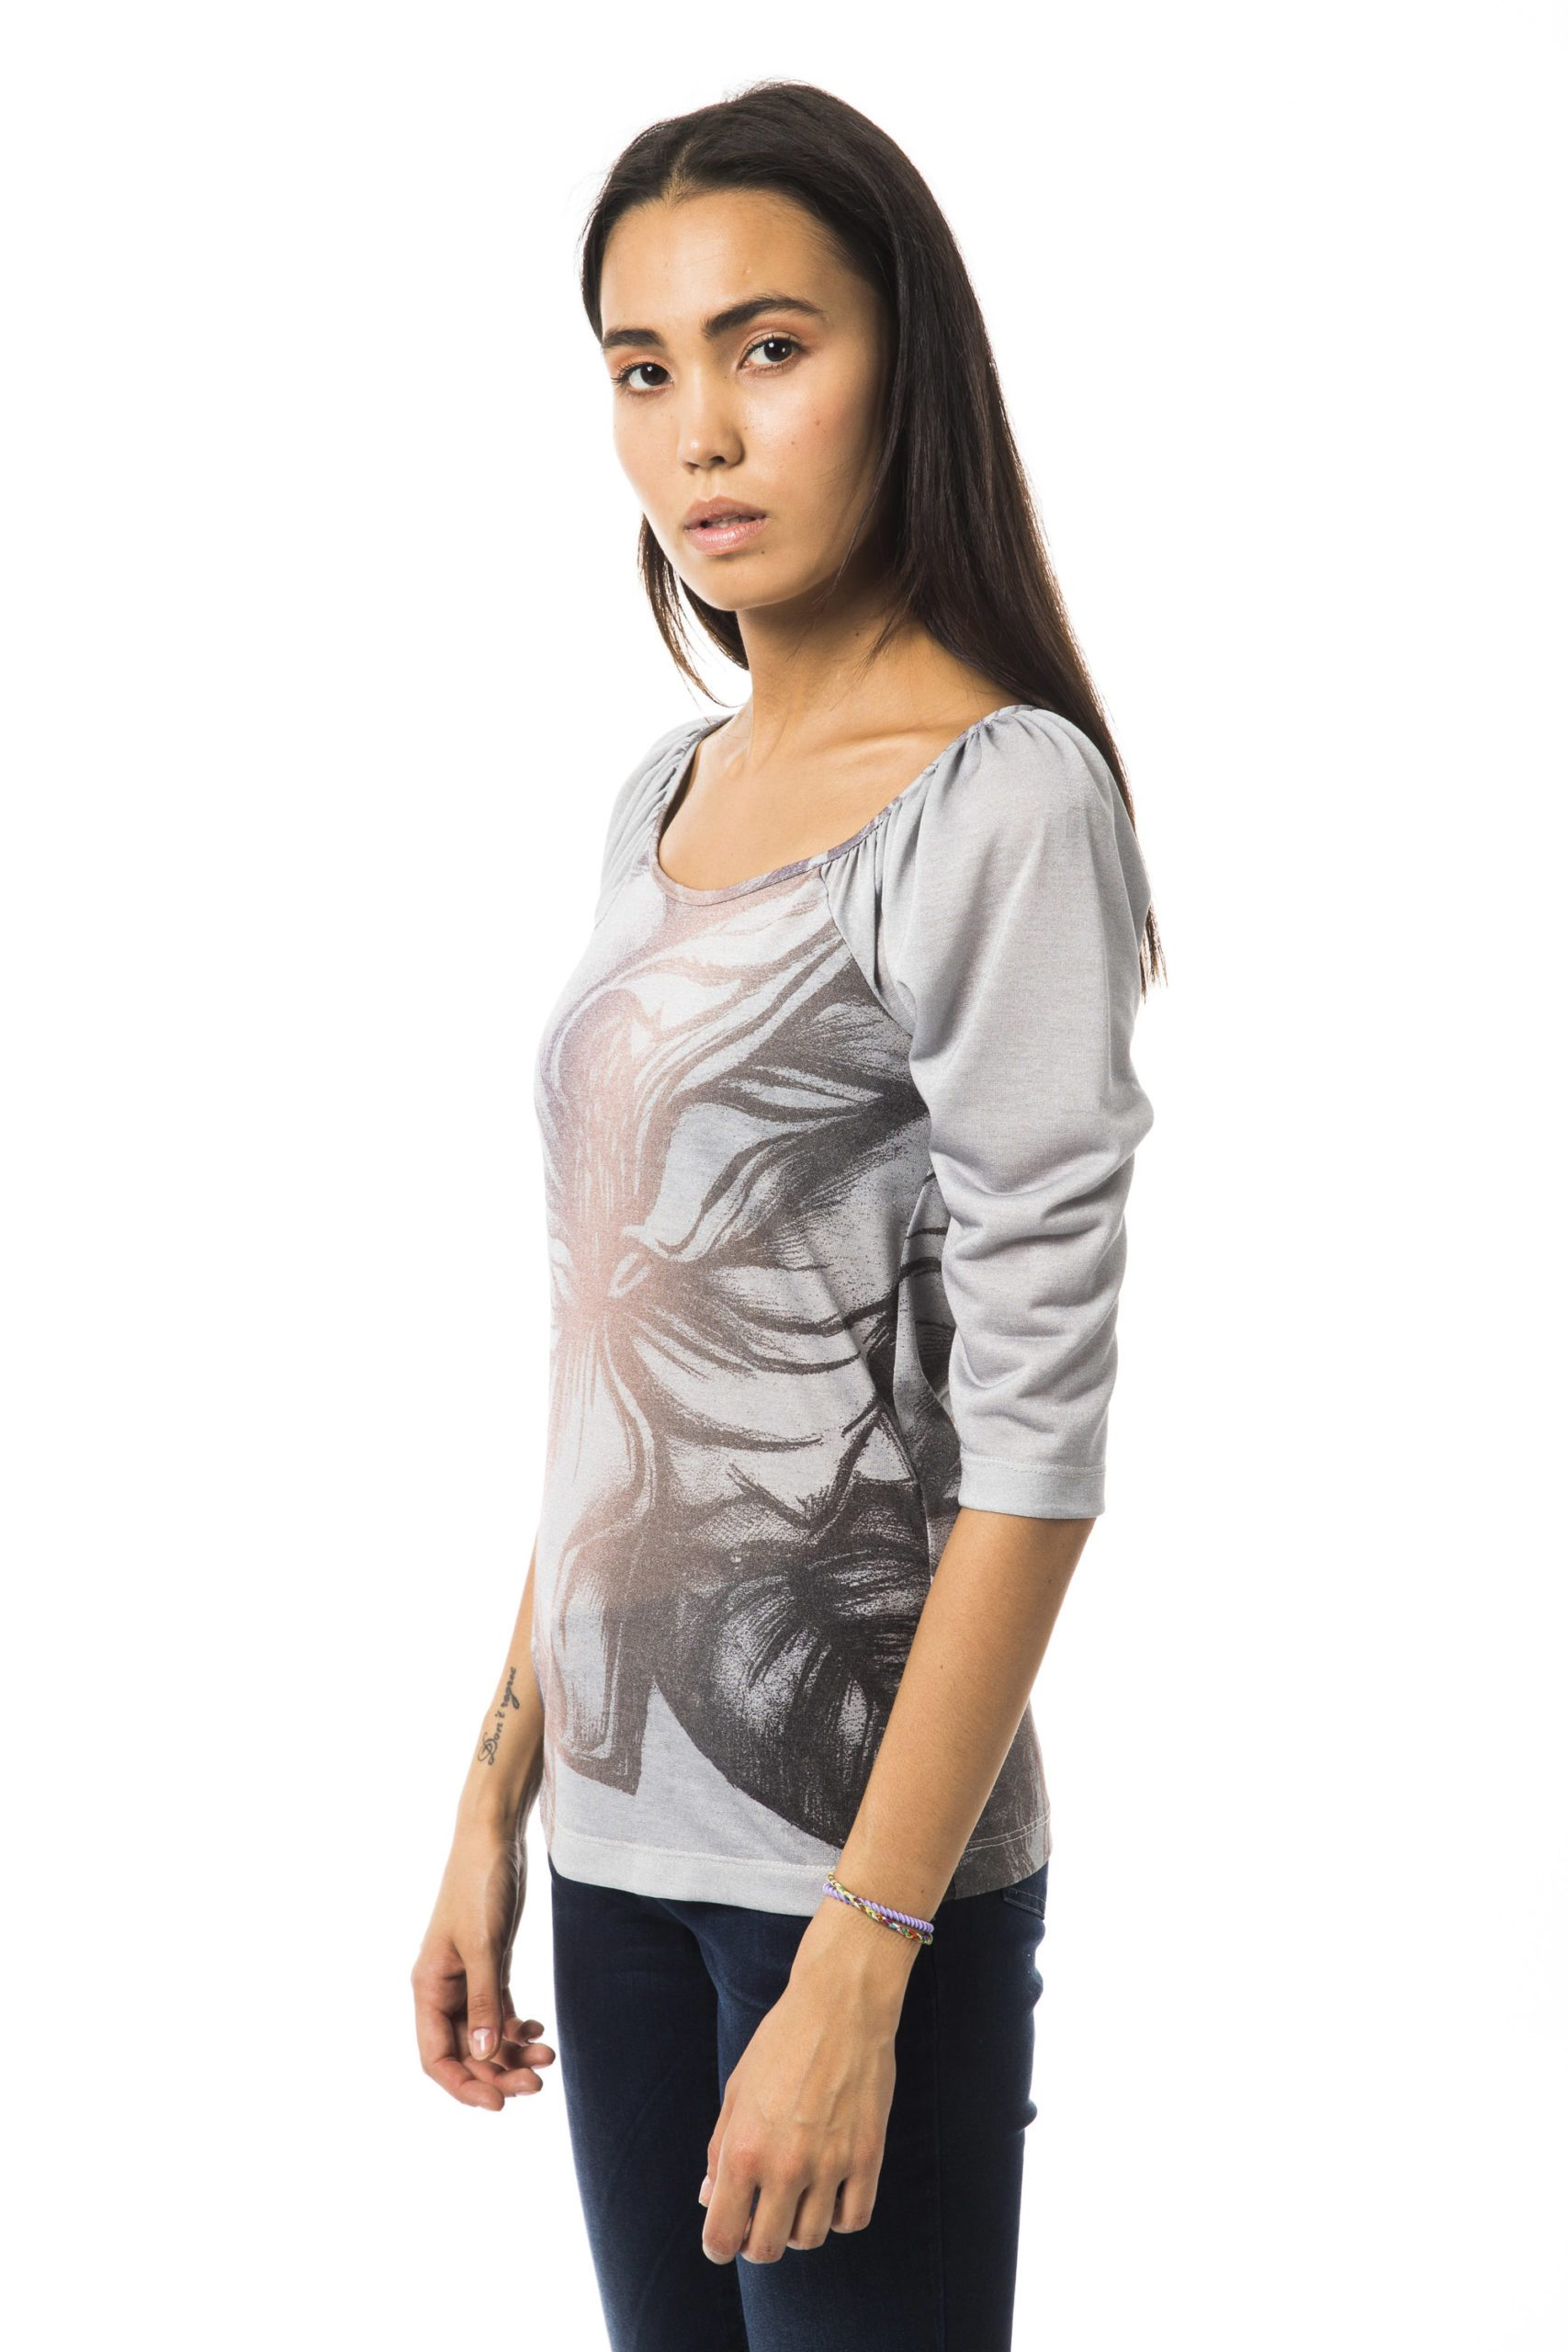 BYBLOS Women's Grigiofumo T-Shirt Gray BY1234733 - XS